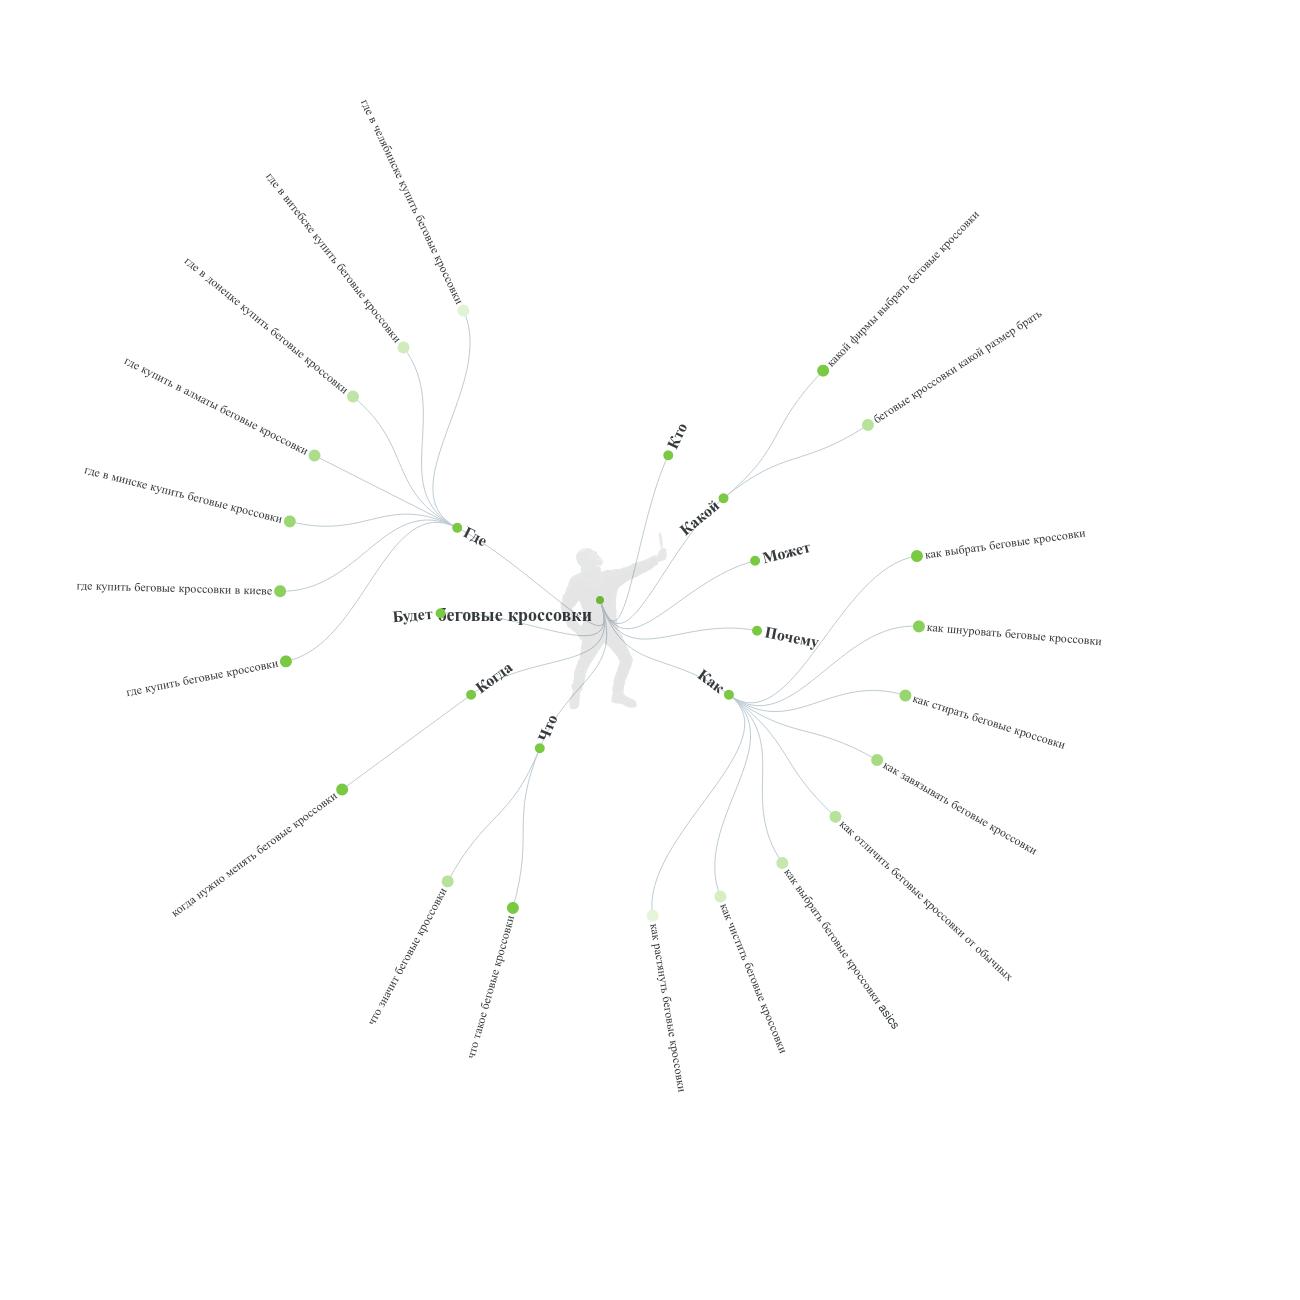 Инструмент AnswerThePublic